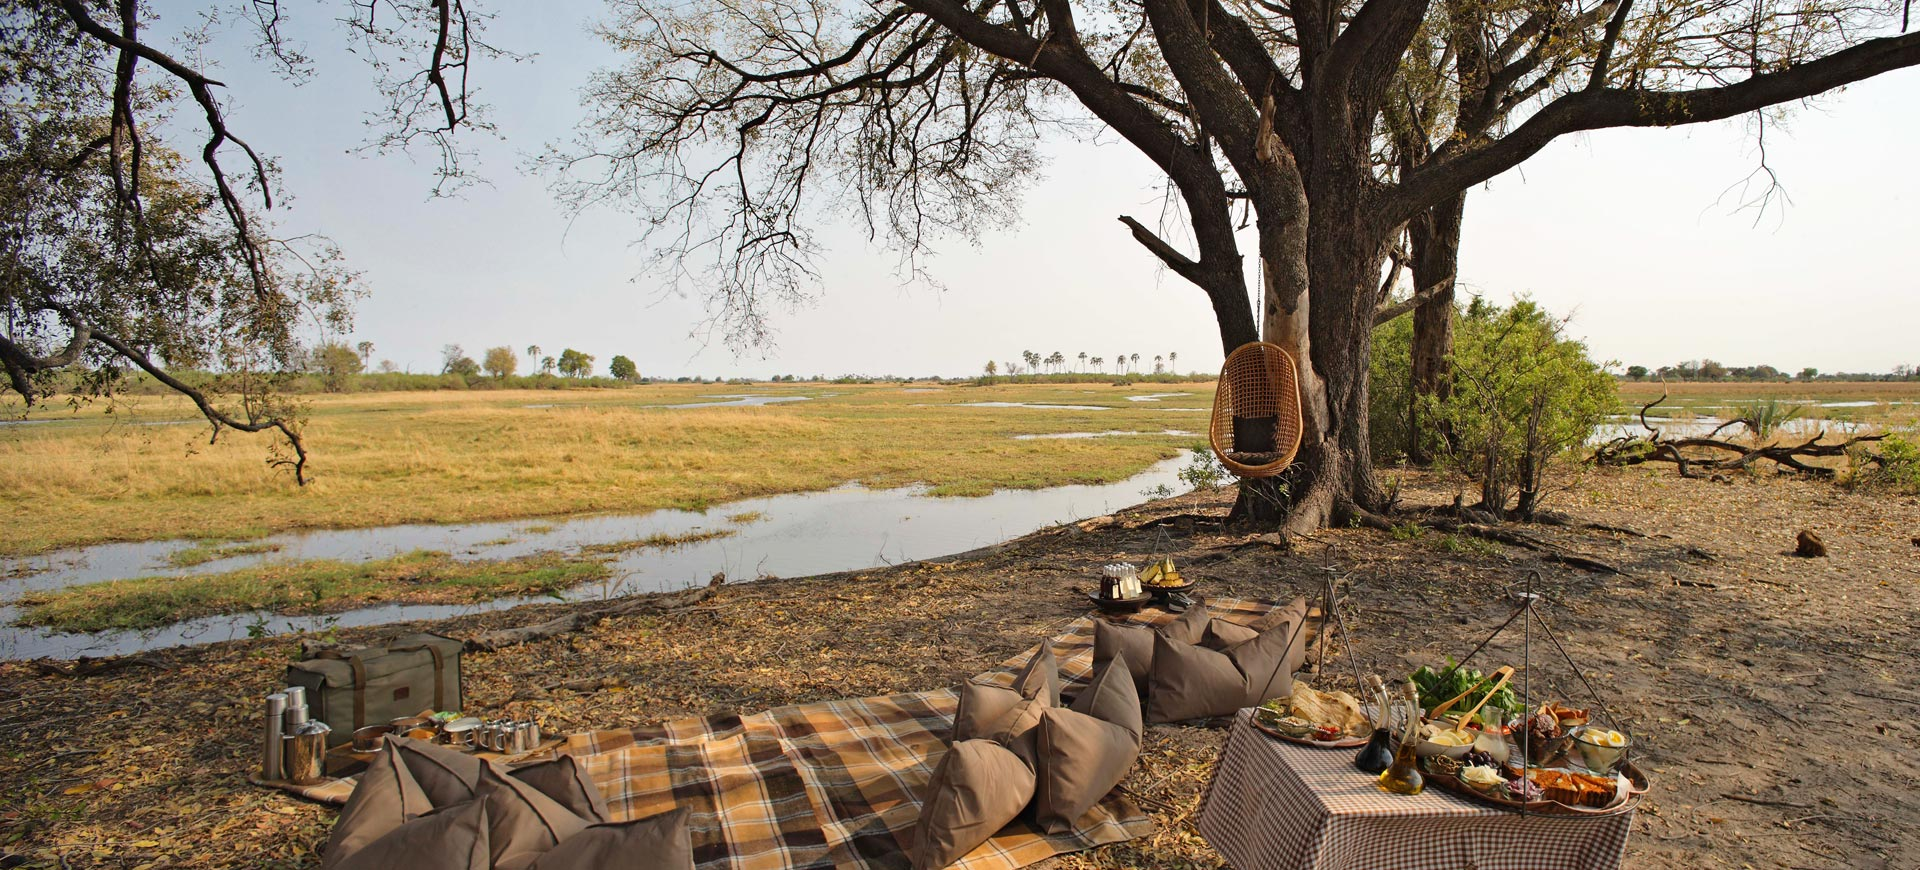 Sandibe Lodge Okavango Delta